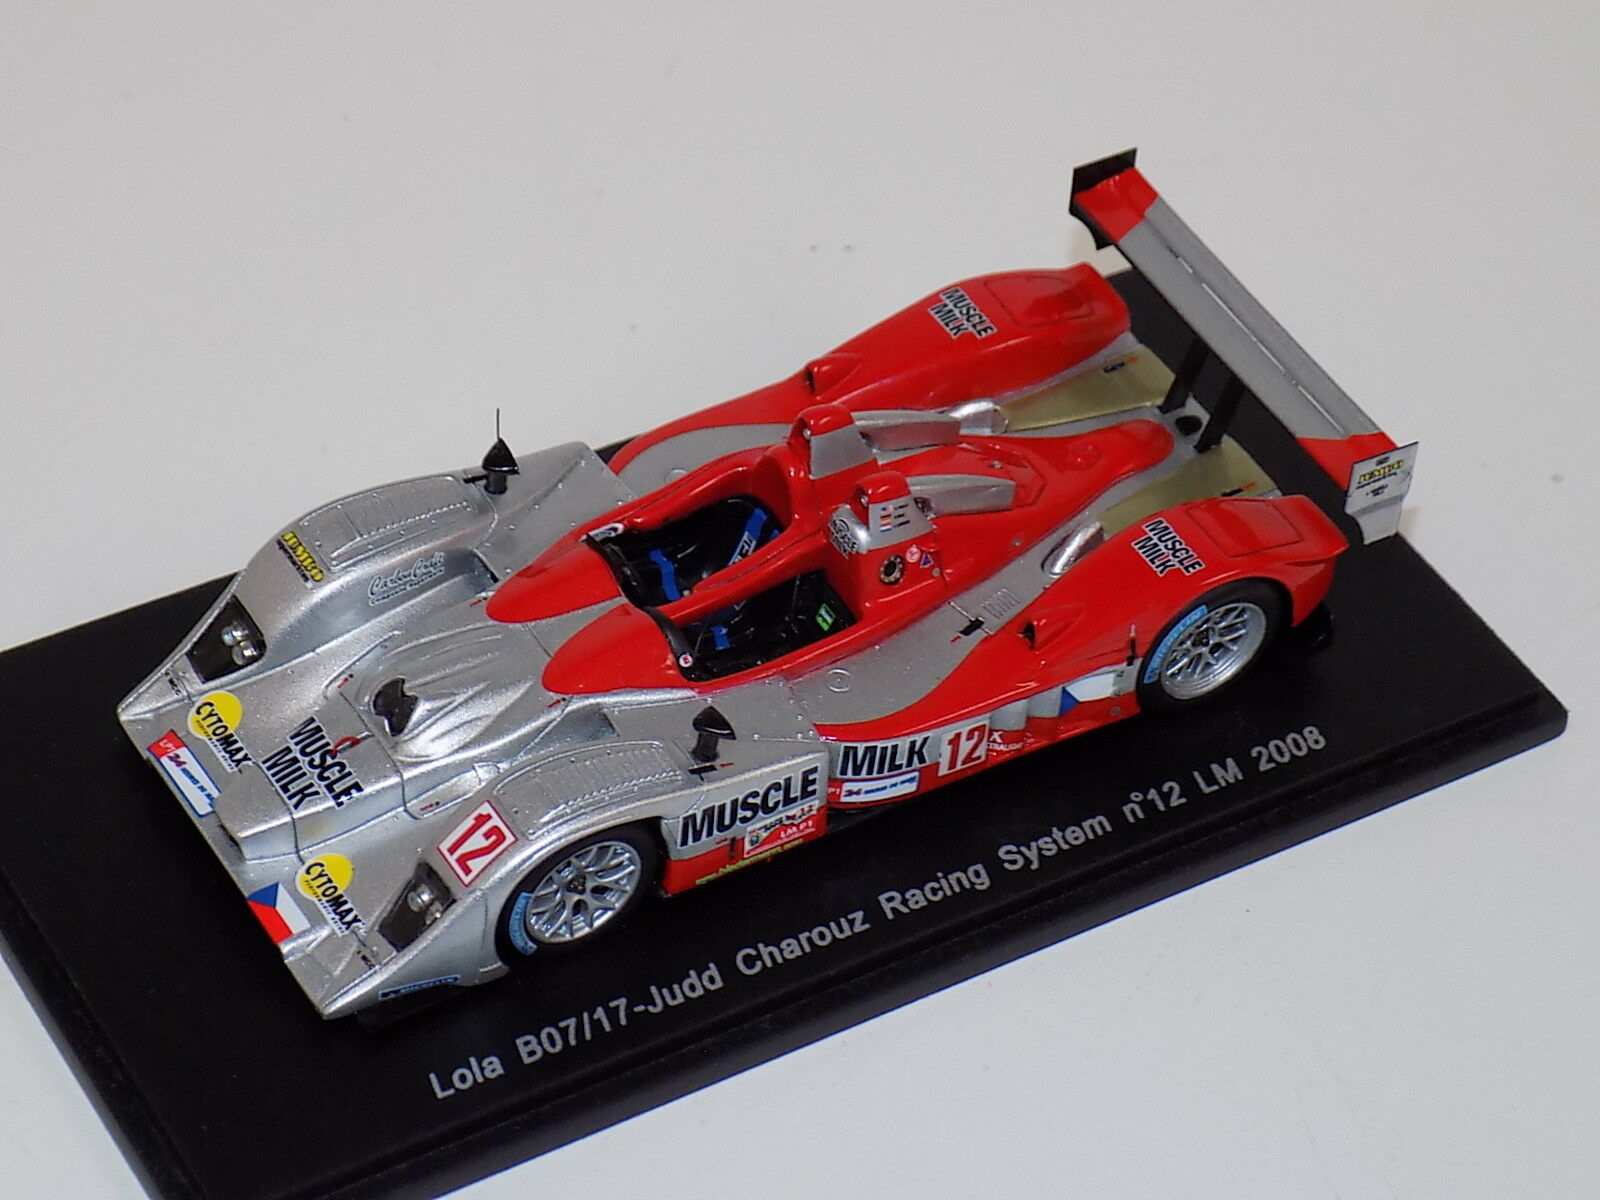 1/43 Spark Lola B07/17 Judd coche 12 24 horas de LeMans 2018 S1429